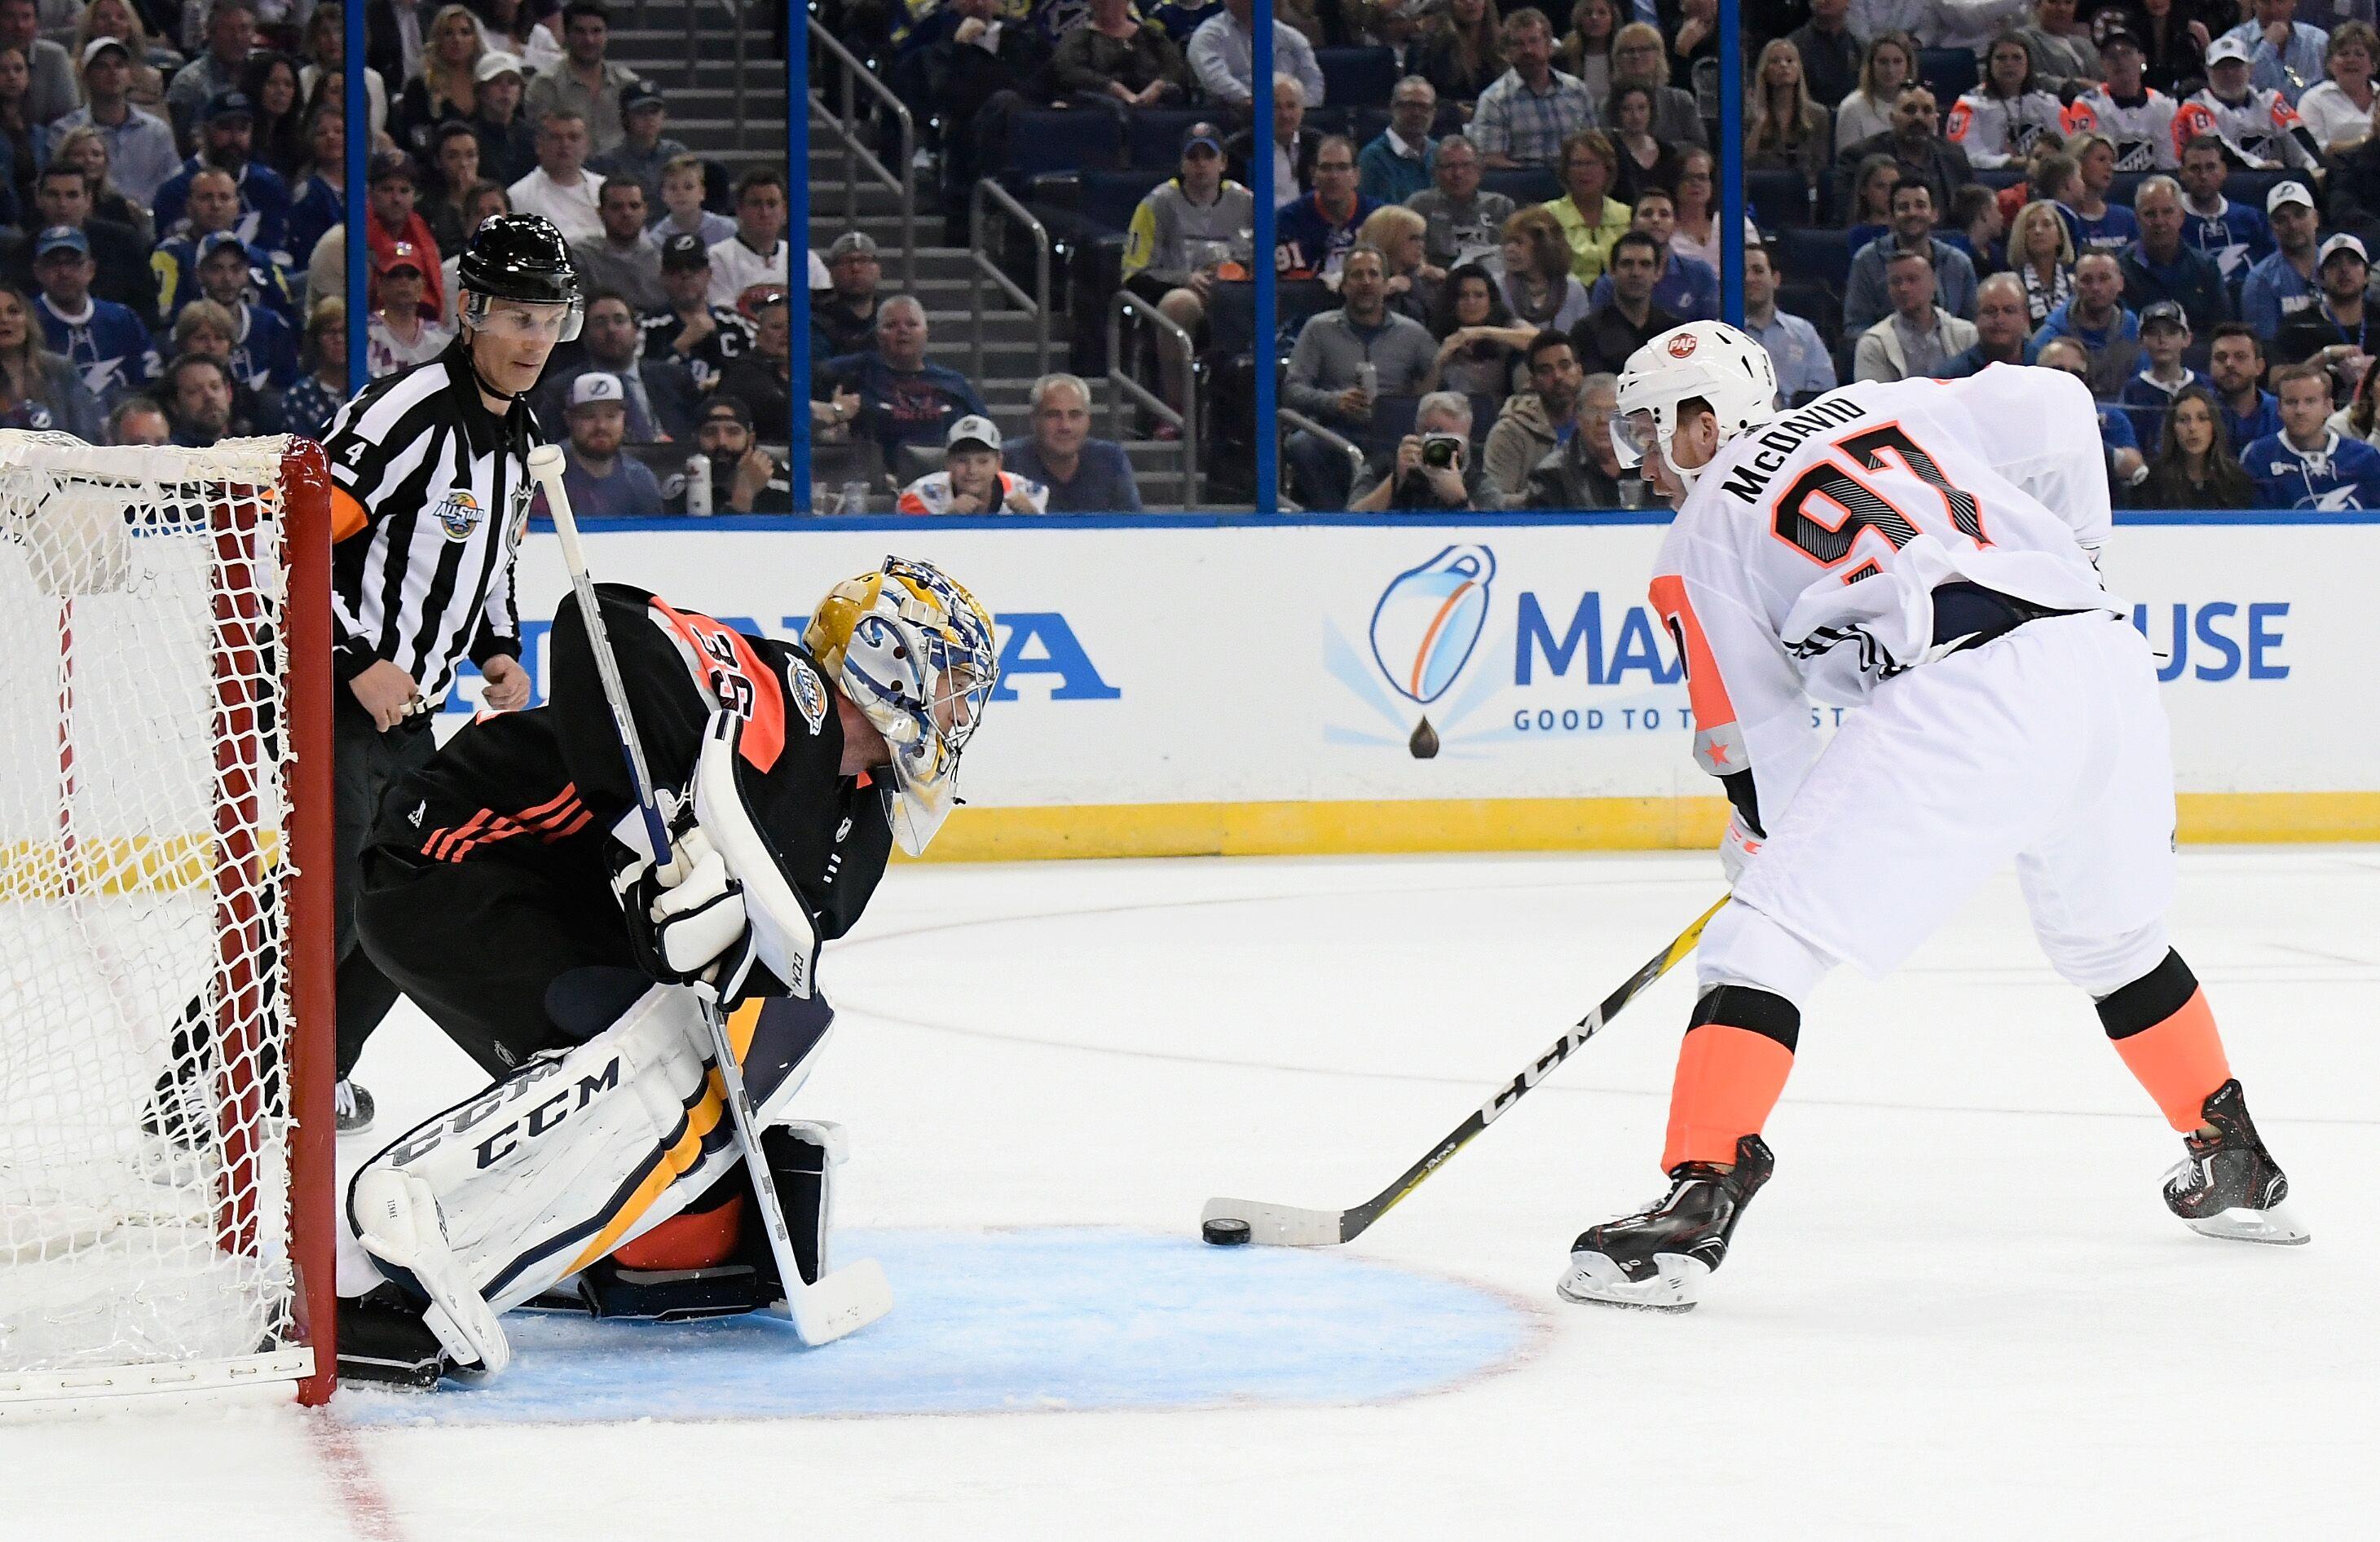 on sale 011d2 253e8 2018 NHL All-Star Game: Predators' Pekka Rinne saves goal ...